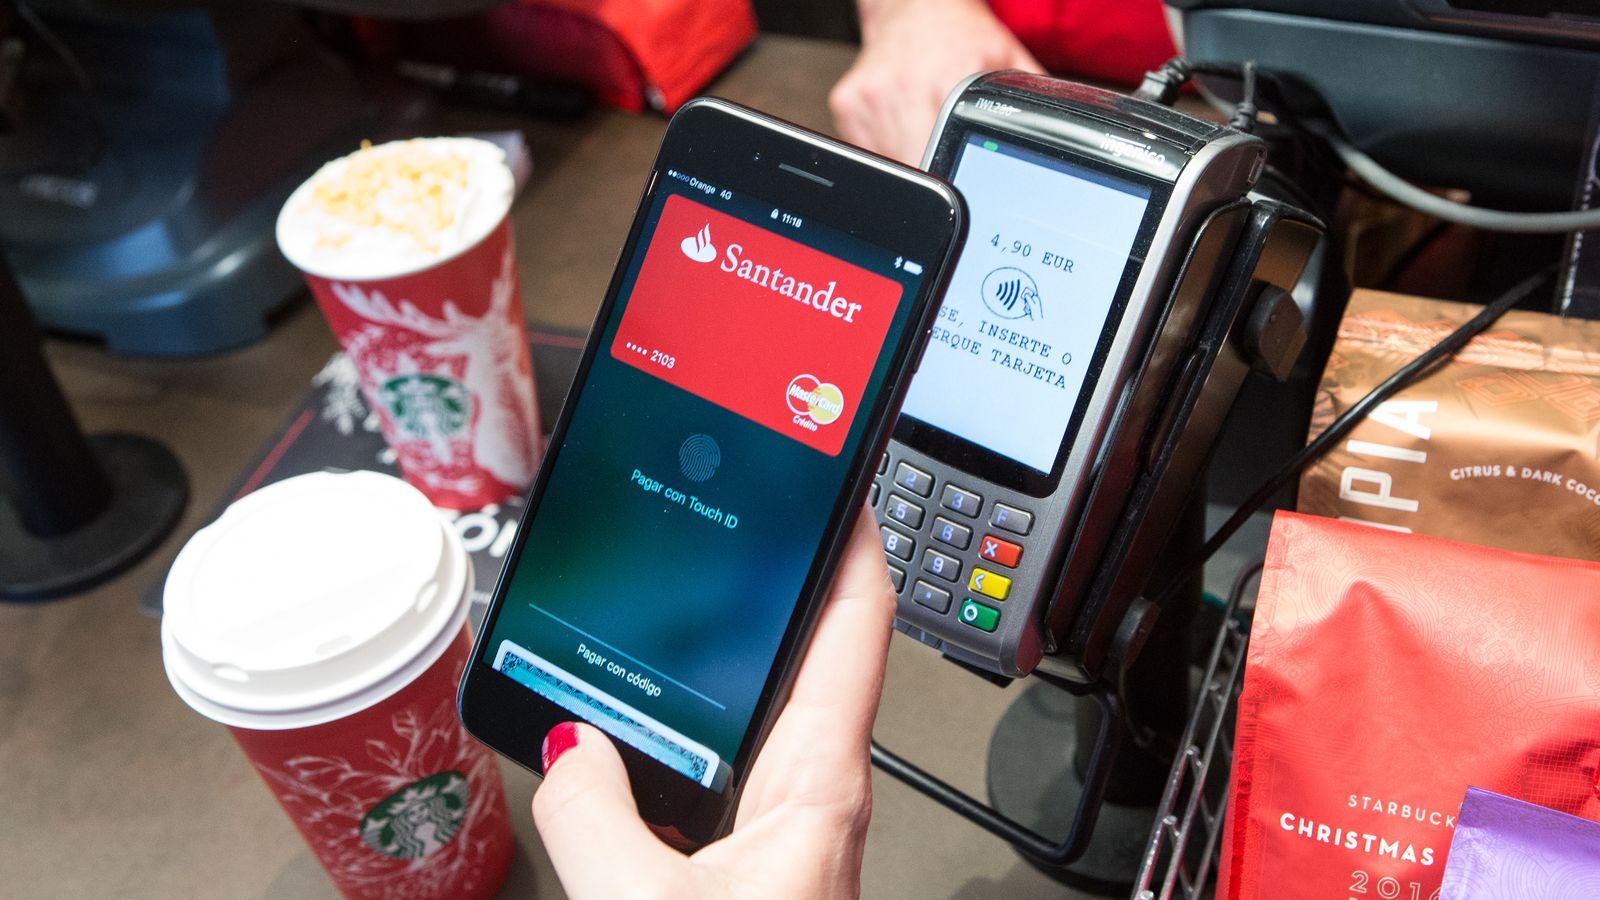 35 percent of US merchants accept Apple Pay